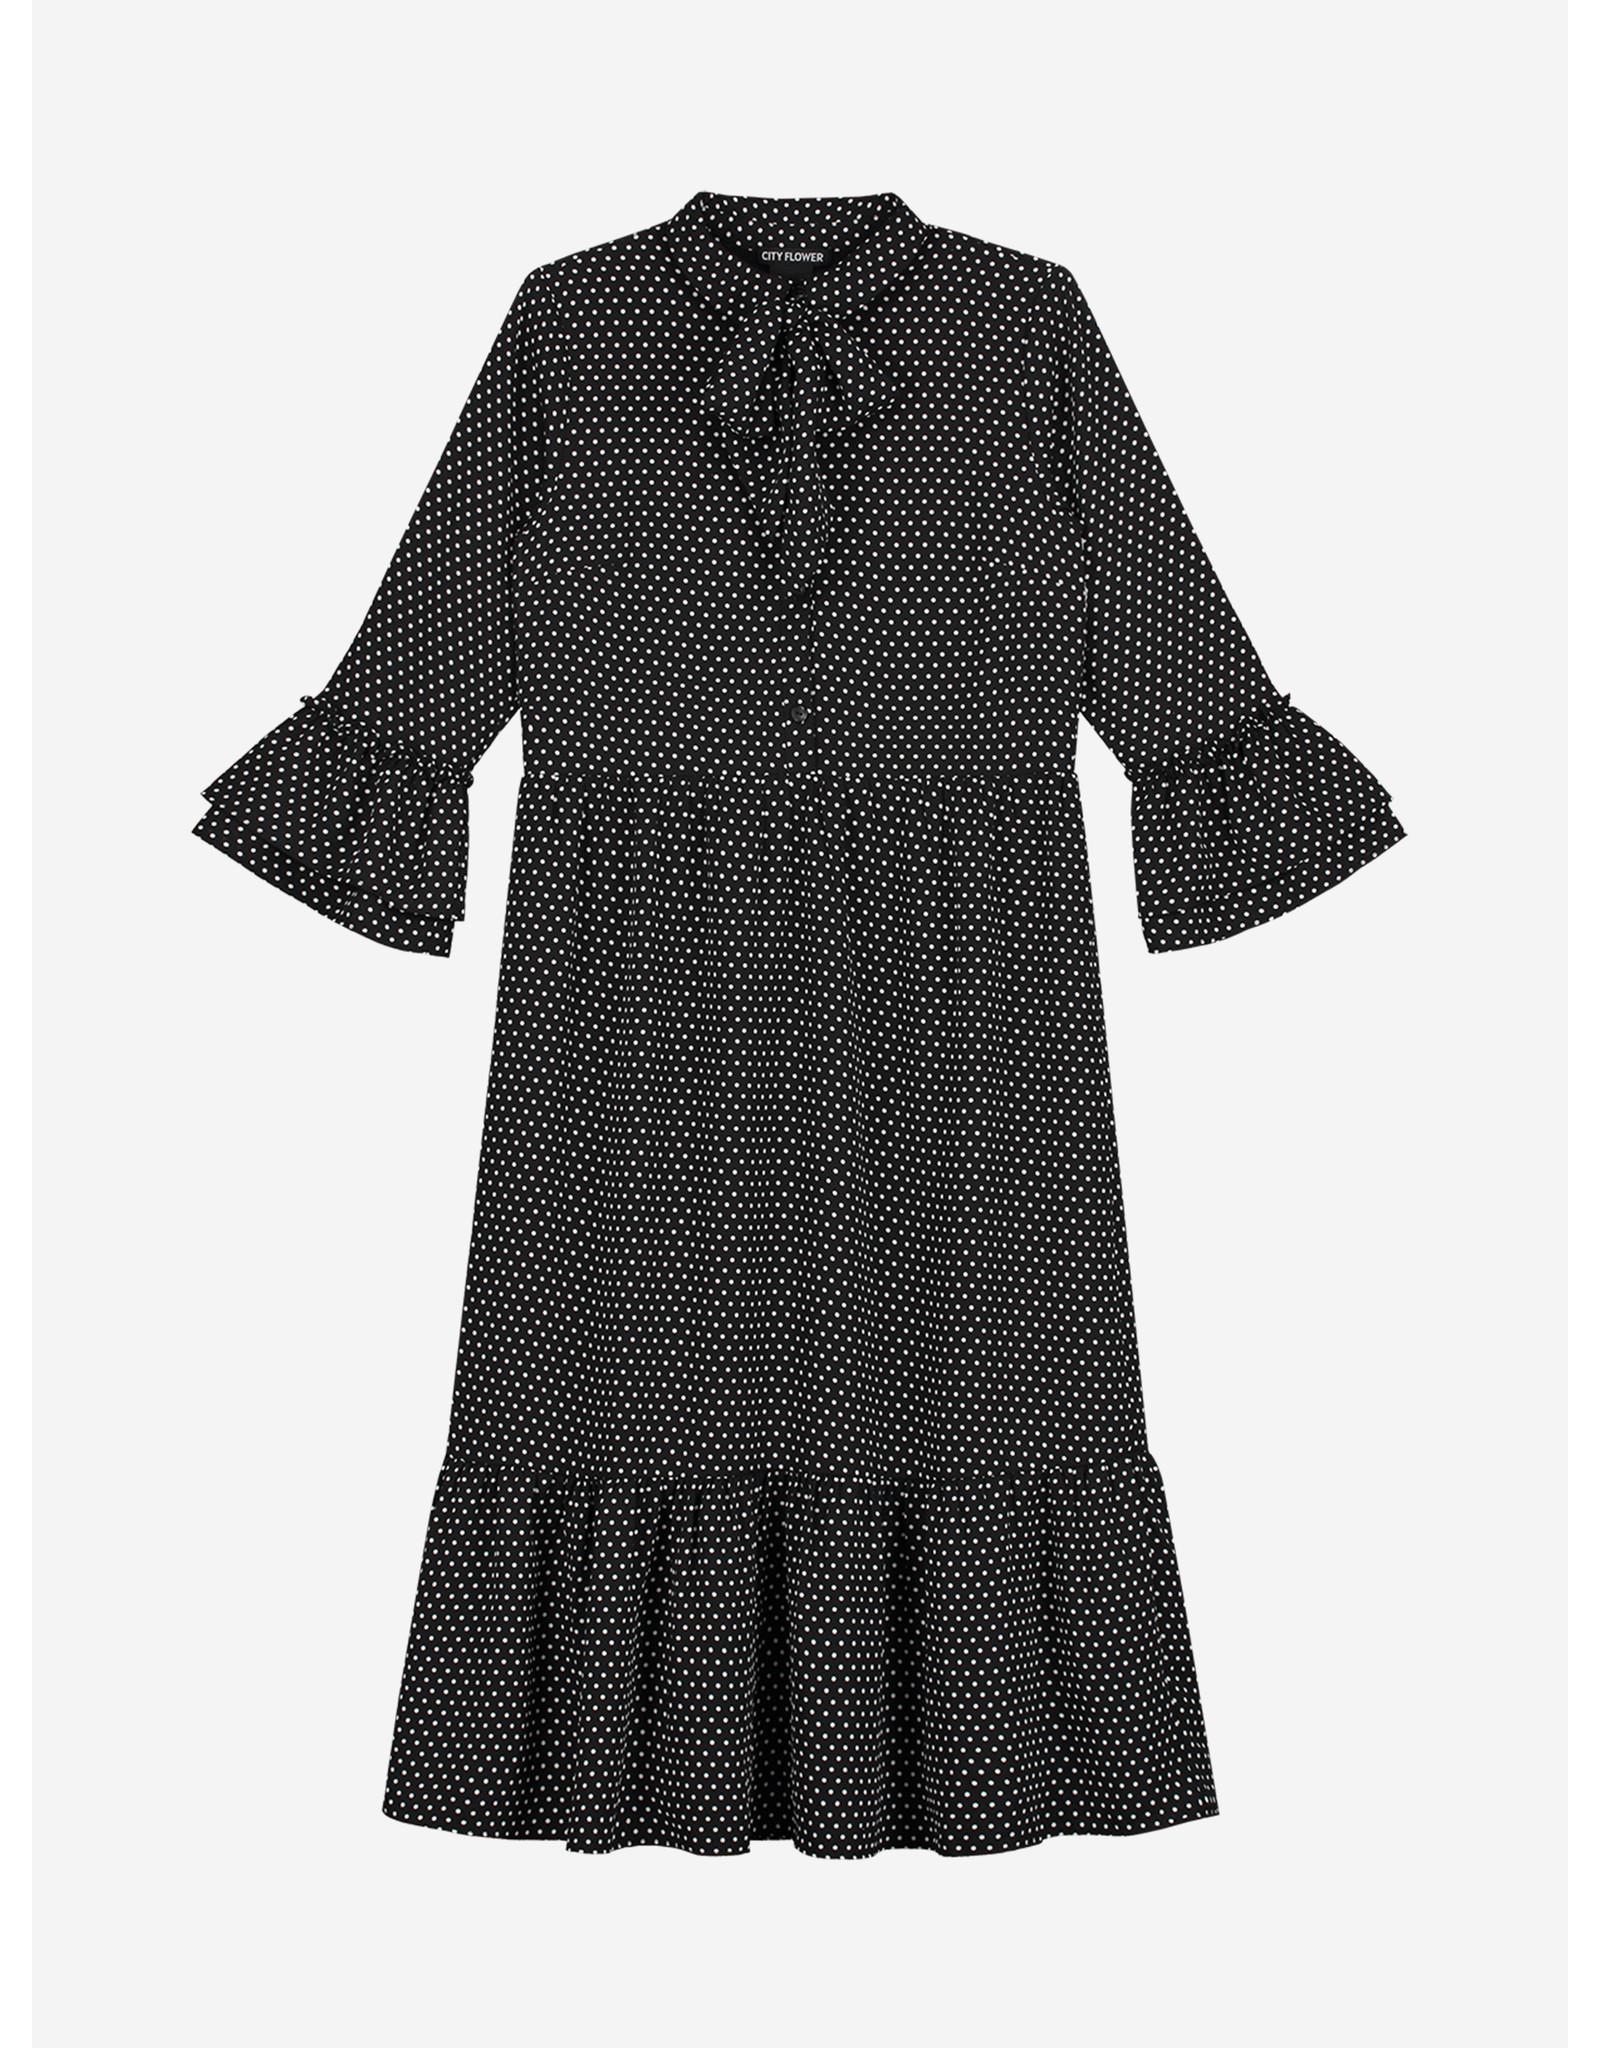 Nik & Nik Tilly Dot Long Dress Black